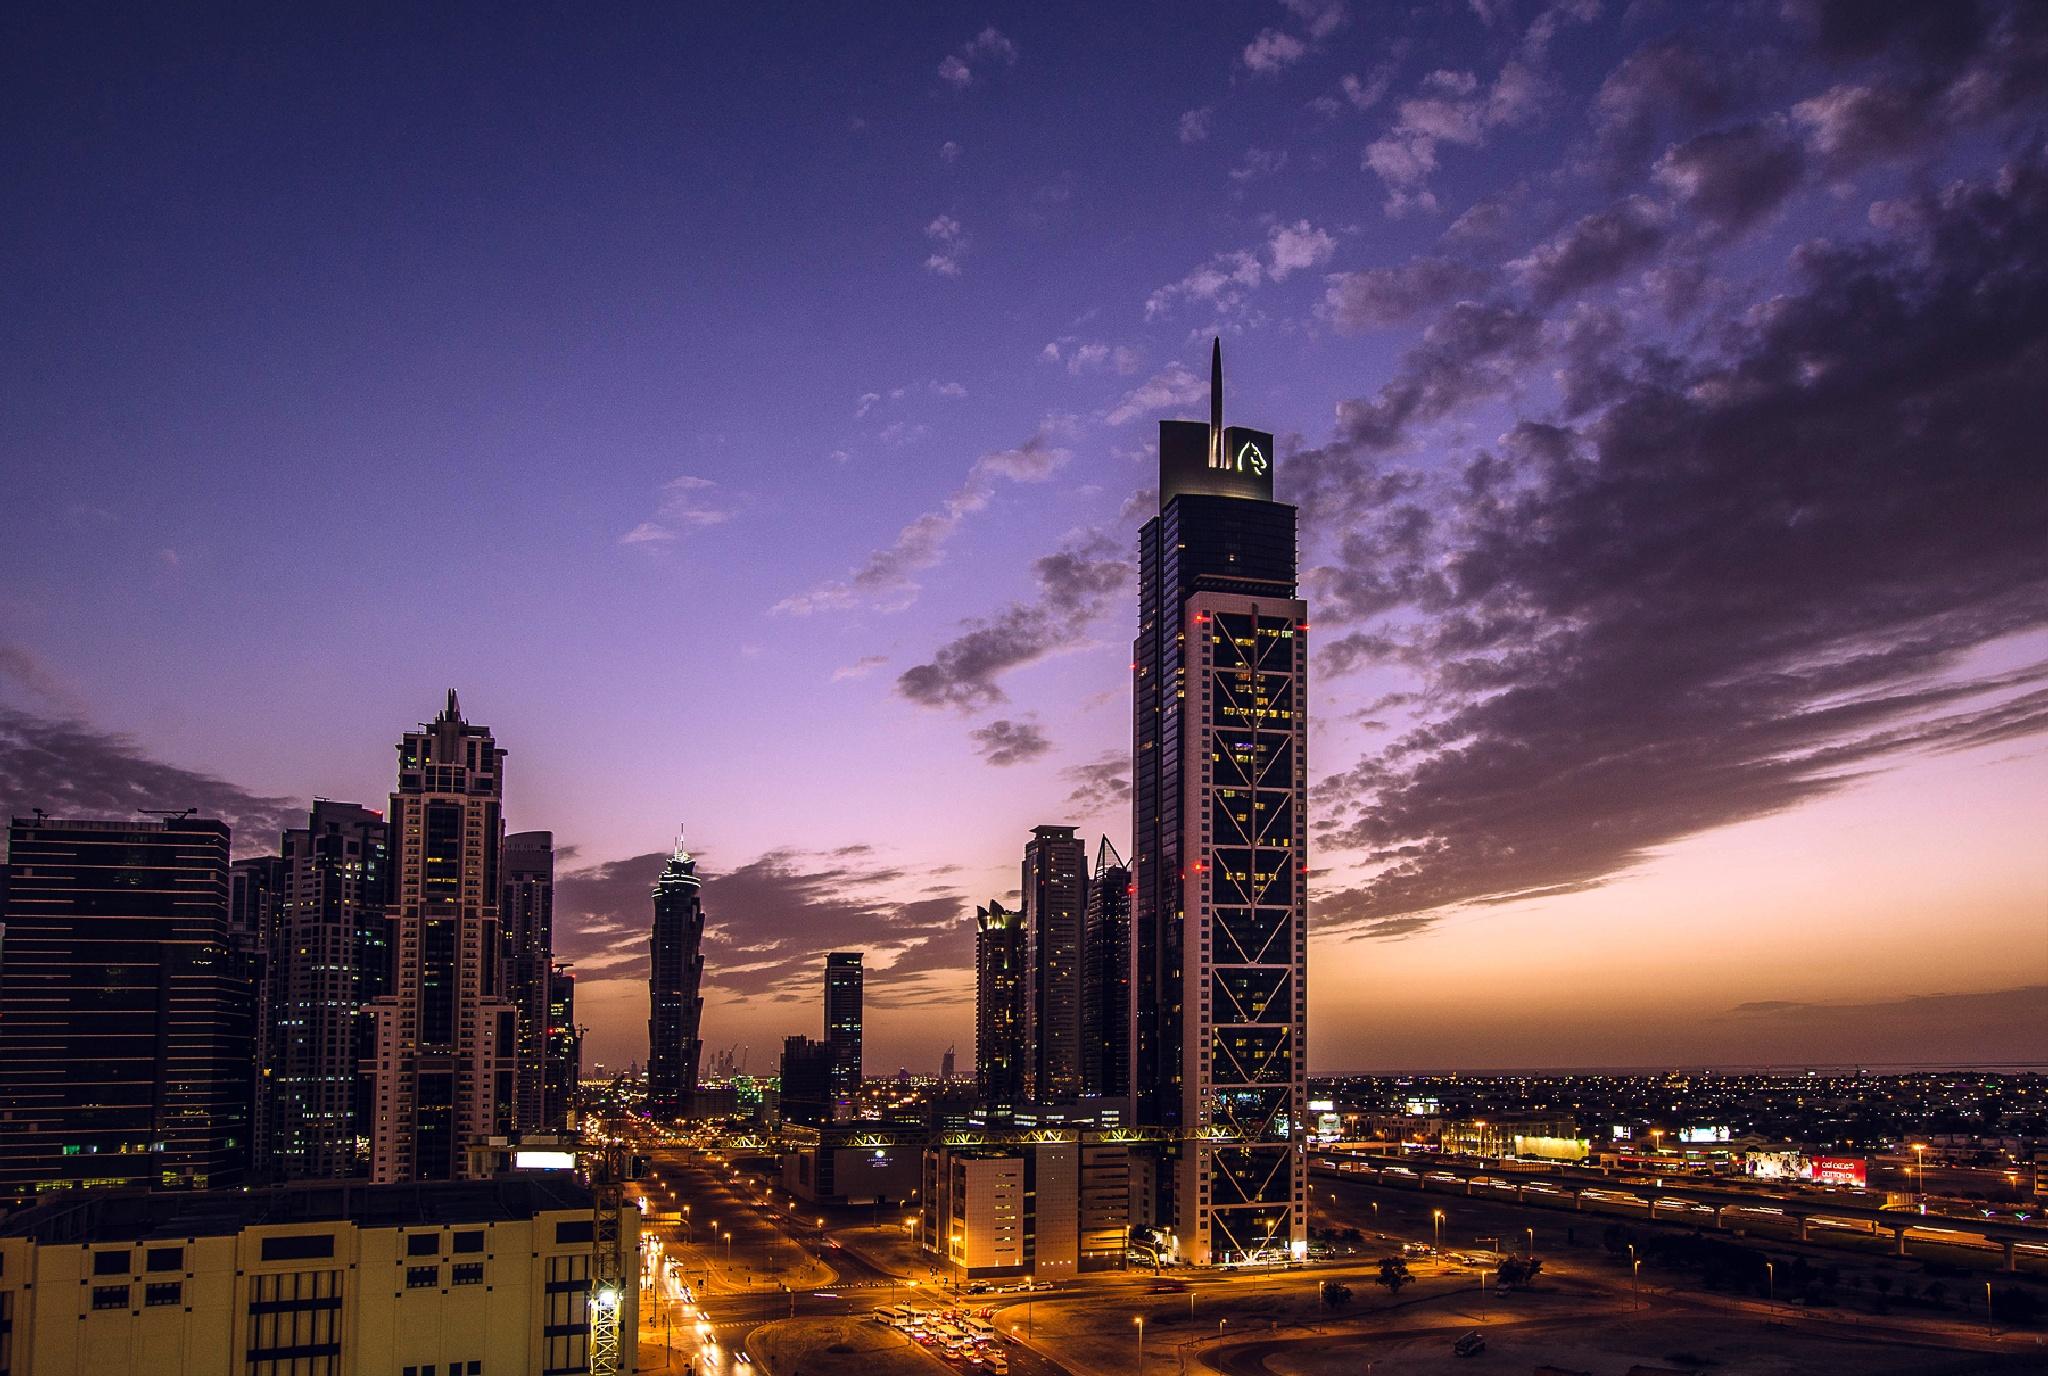 Evening sky in Downtown Dubai by MrBpix